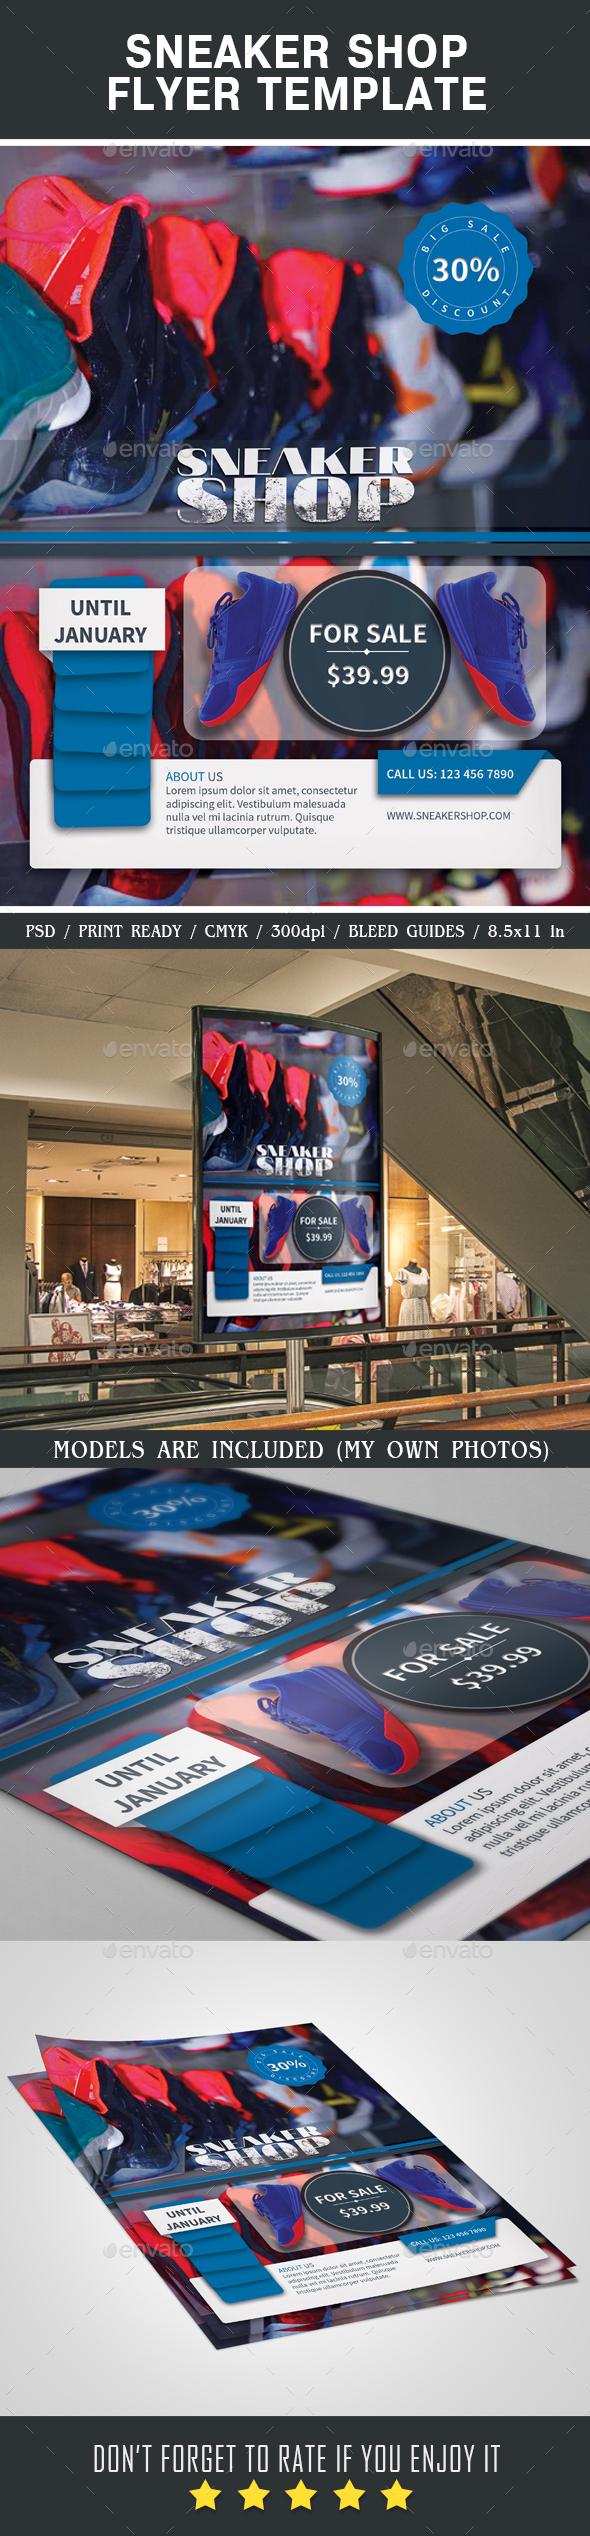 Sneaker Shop Flyer - Miscellaneous Events